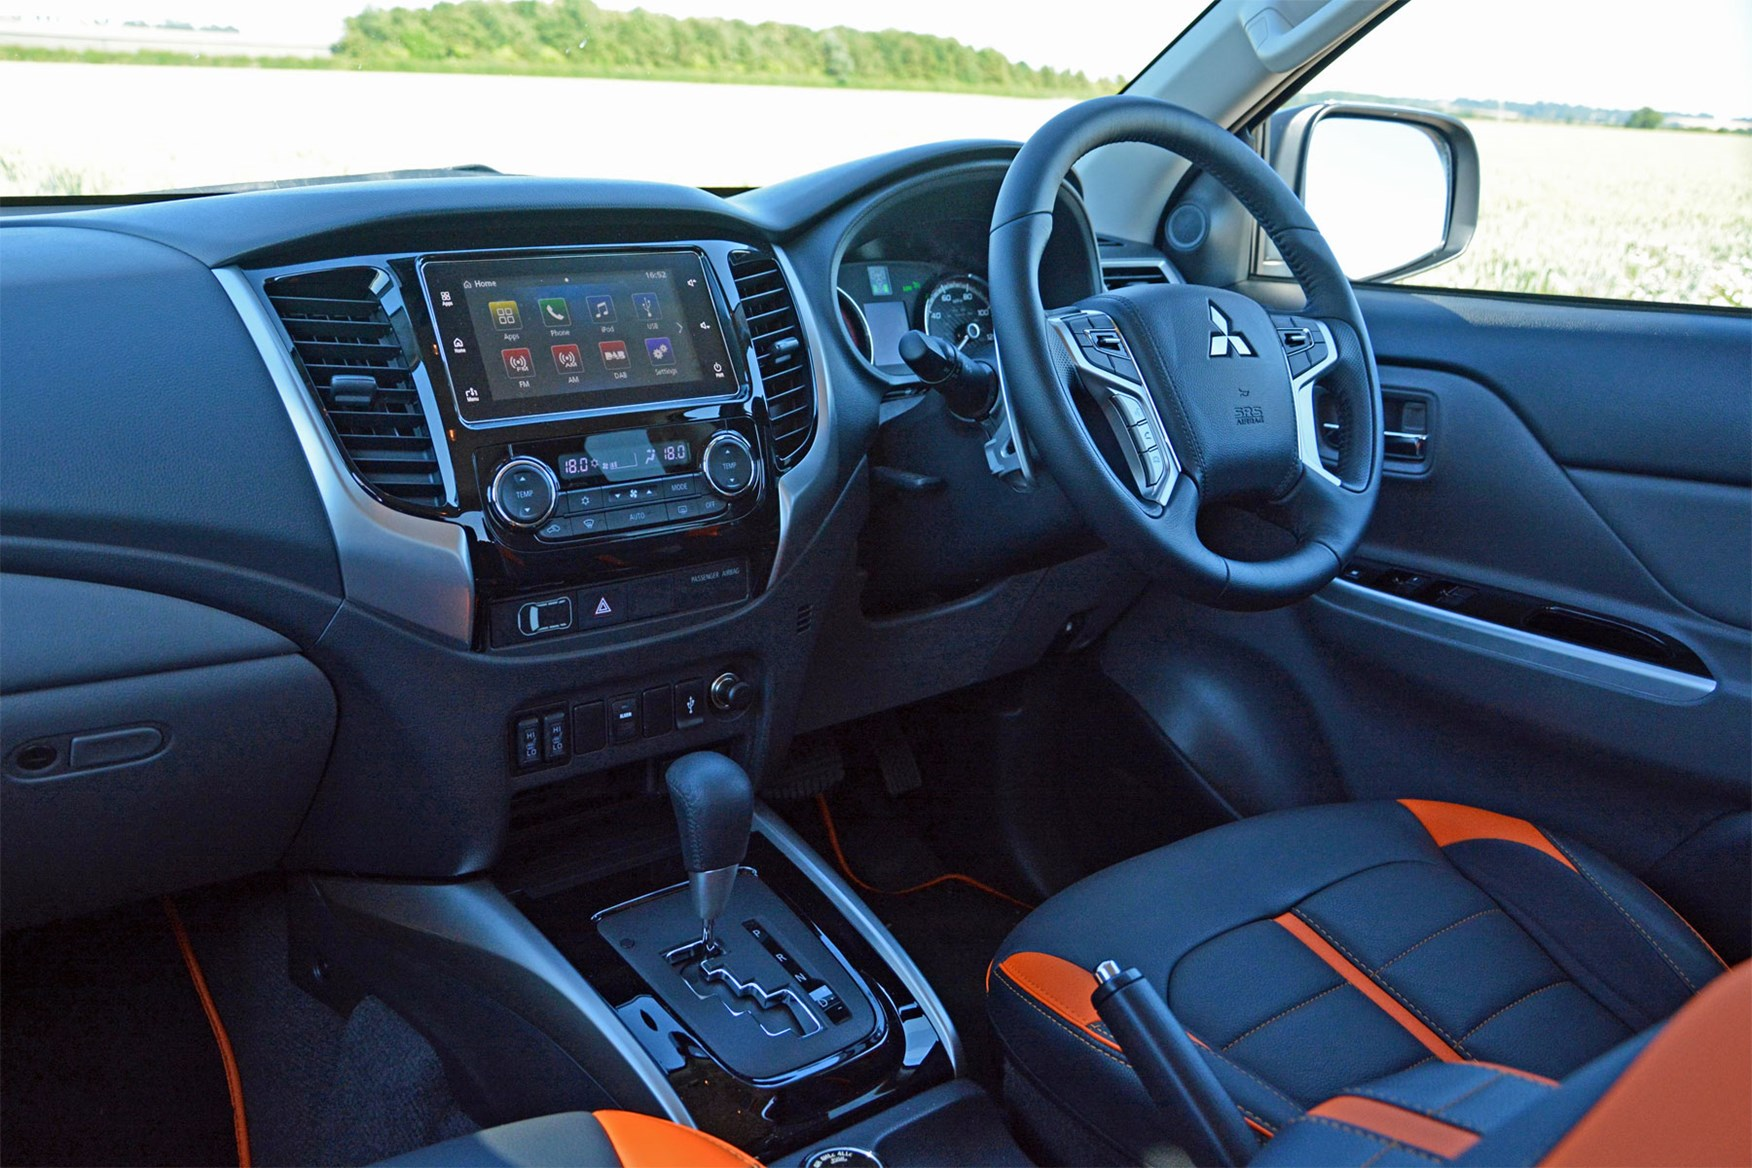 Mitsubishi L200 Barbarian SVP II review - cab interior, steering wheel, dash board, black and orange